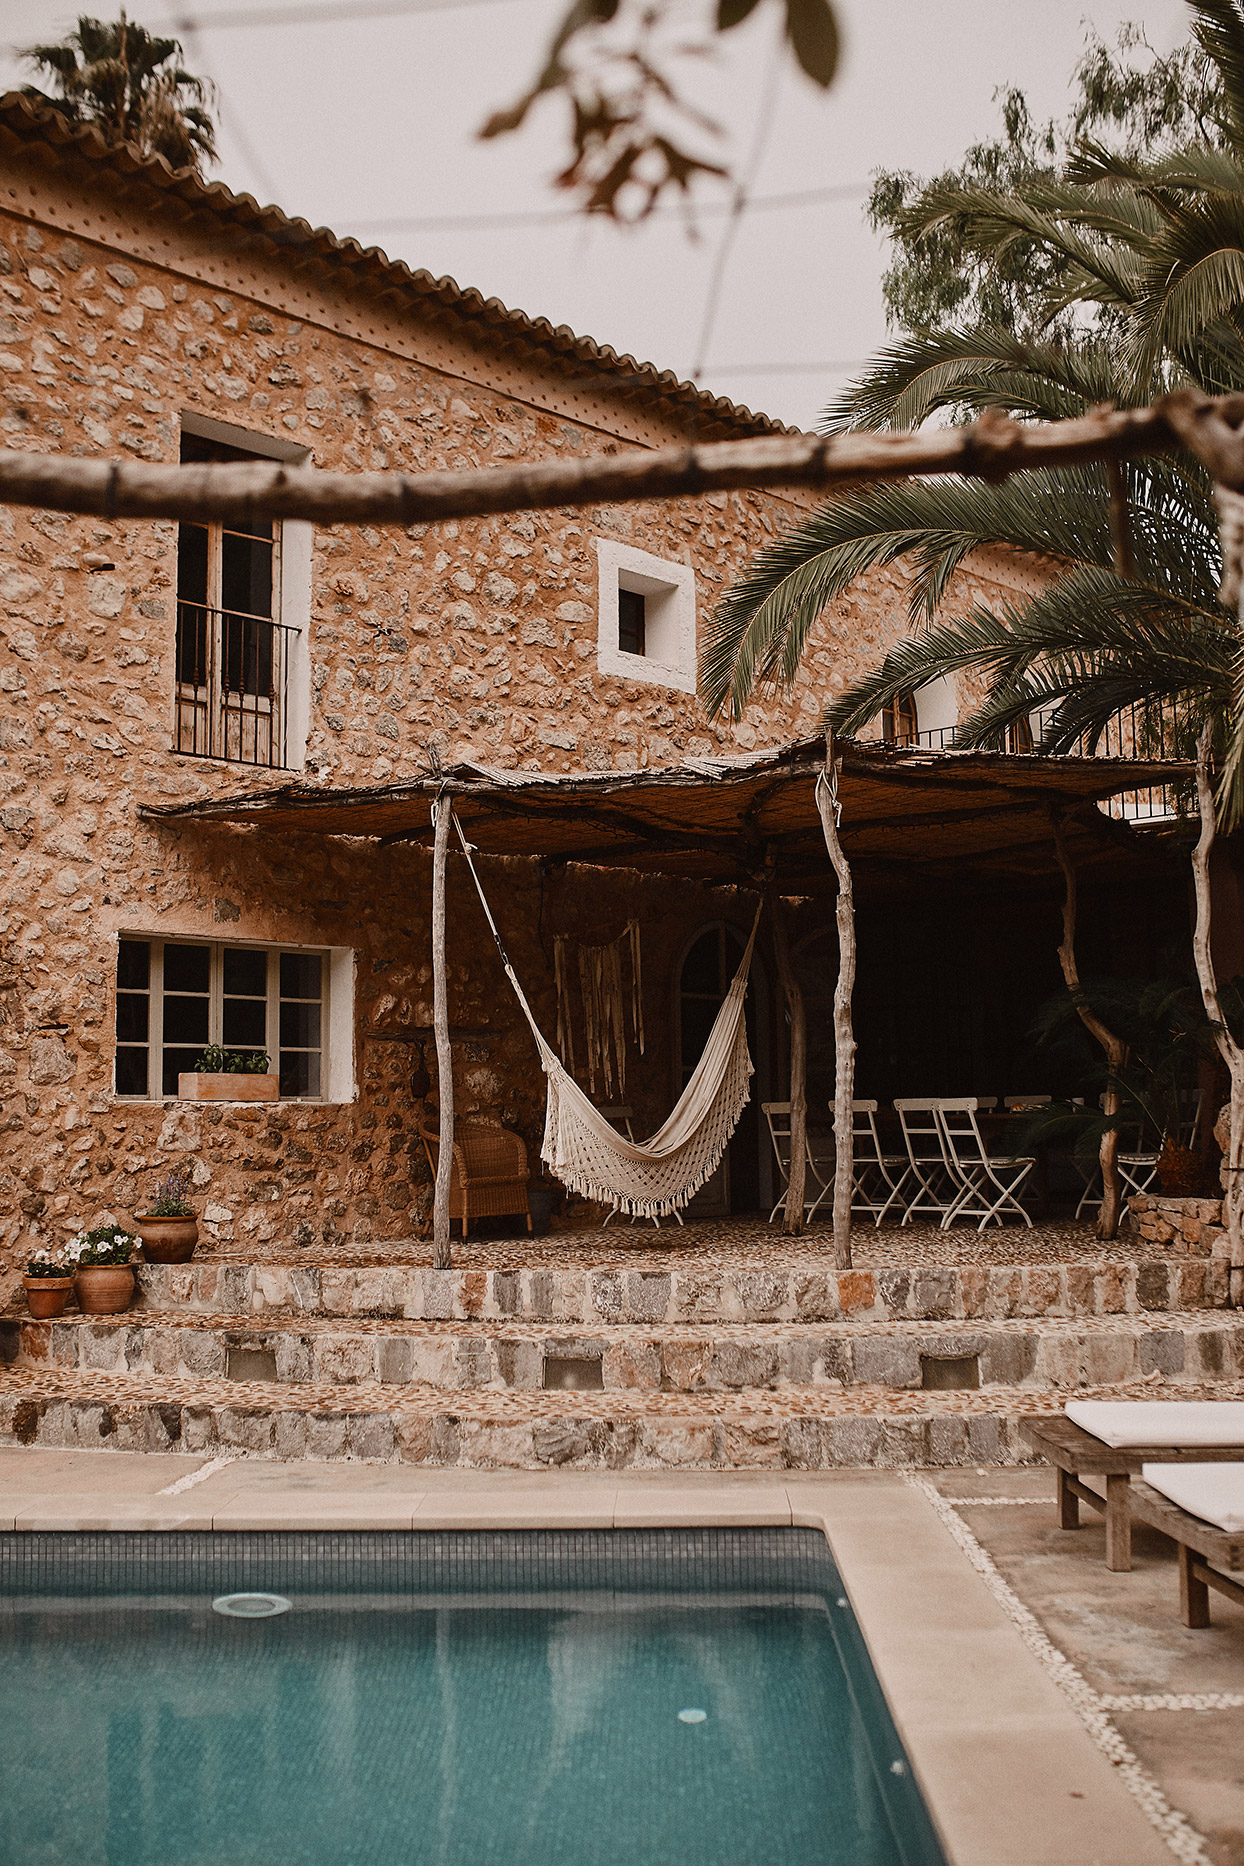 pomme daniel wedding venue swimming pool stone steps